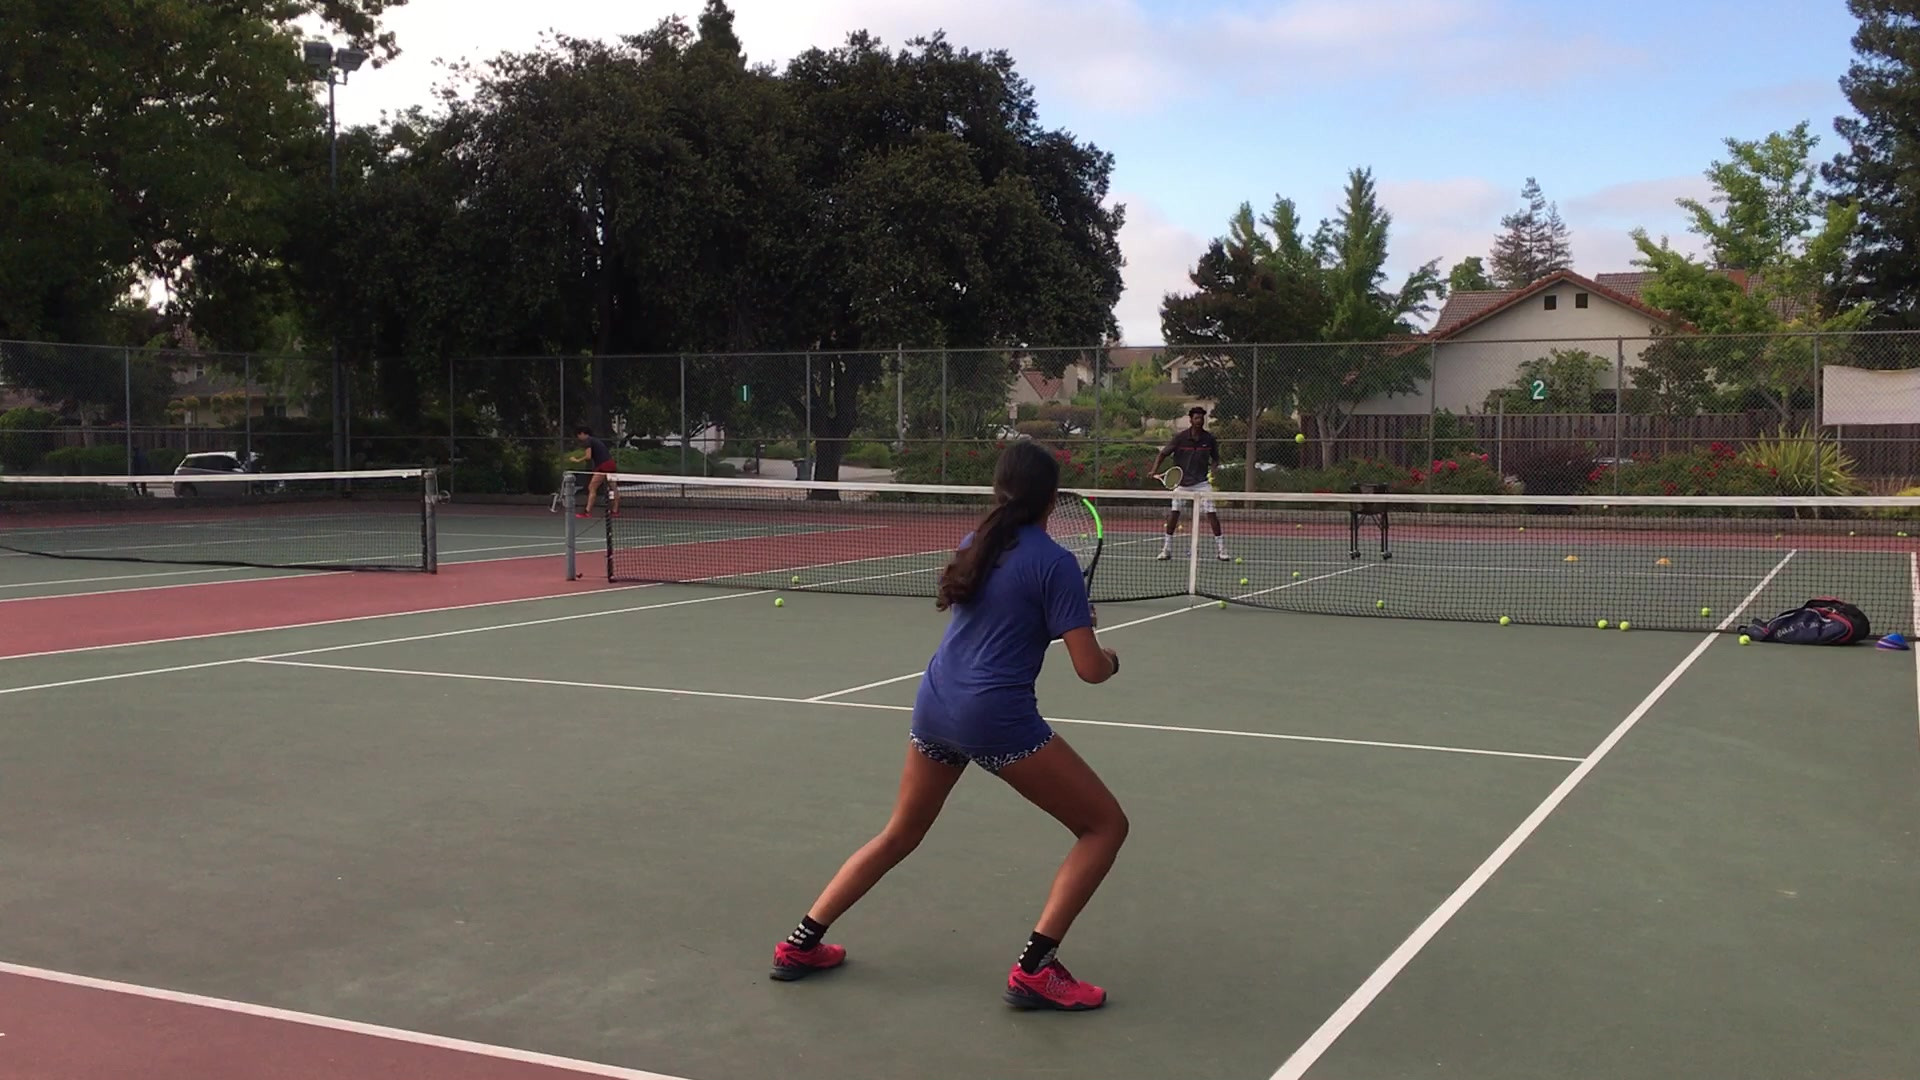 Rallying: Tennis Lesson